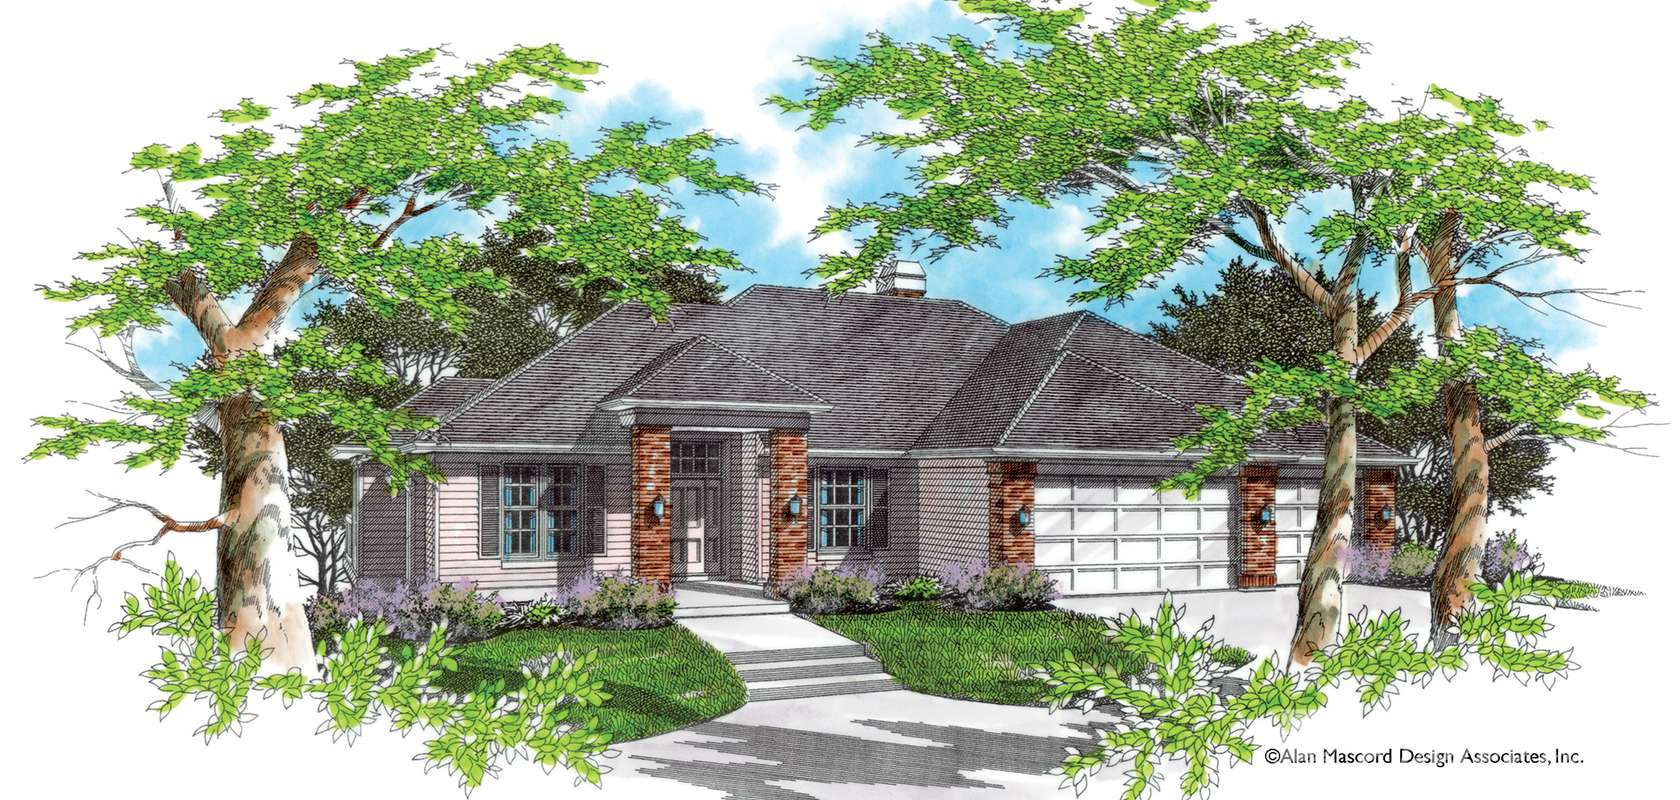 Mascord House Plan 1307: The Baldwin